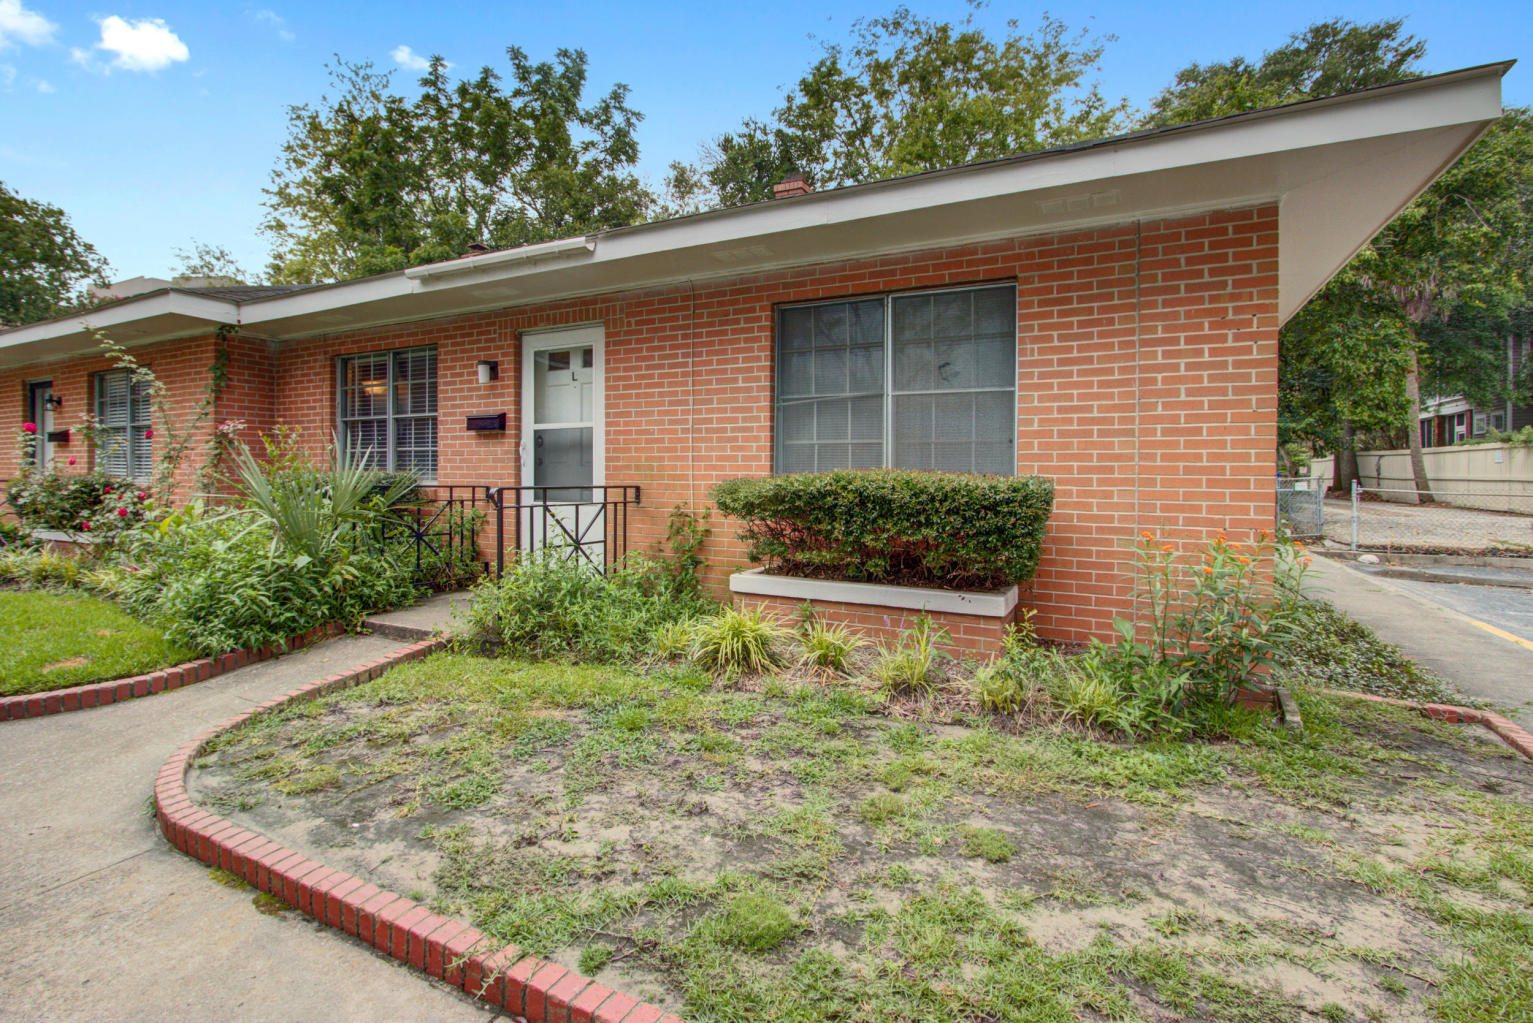 Rutledge Green Homes For Sale - 173 Rutledge, Charleston, SC - 2